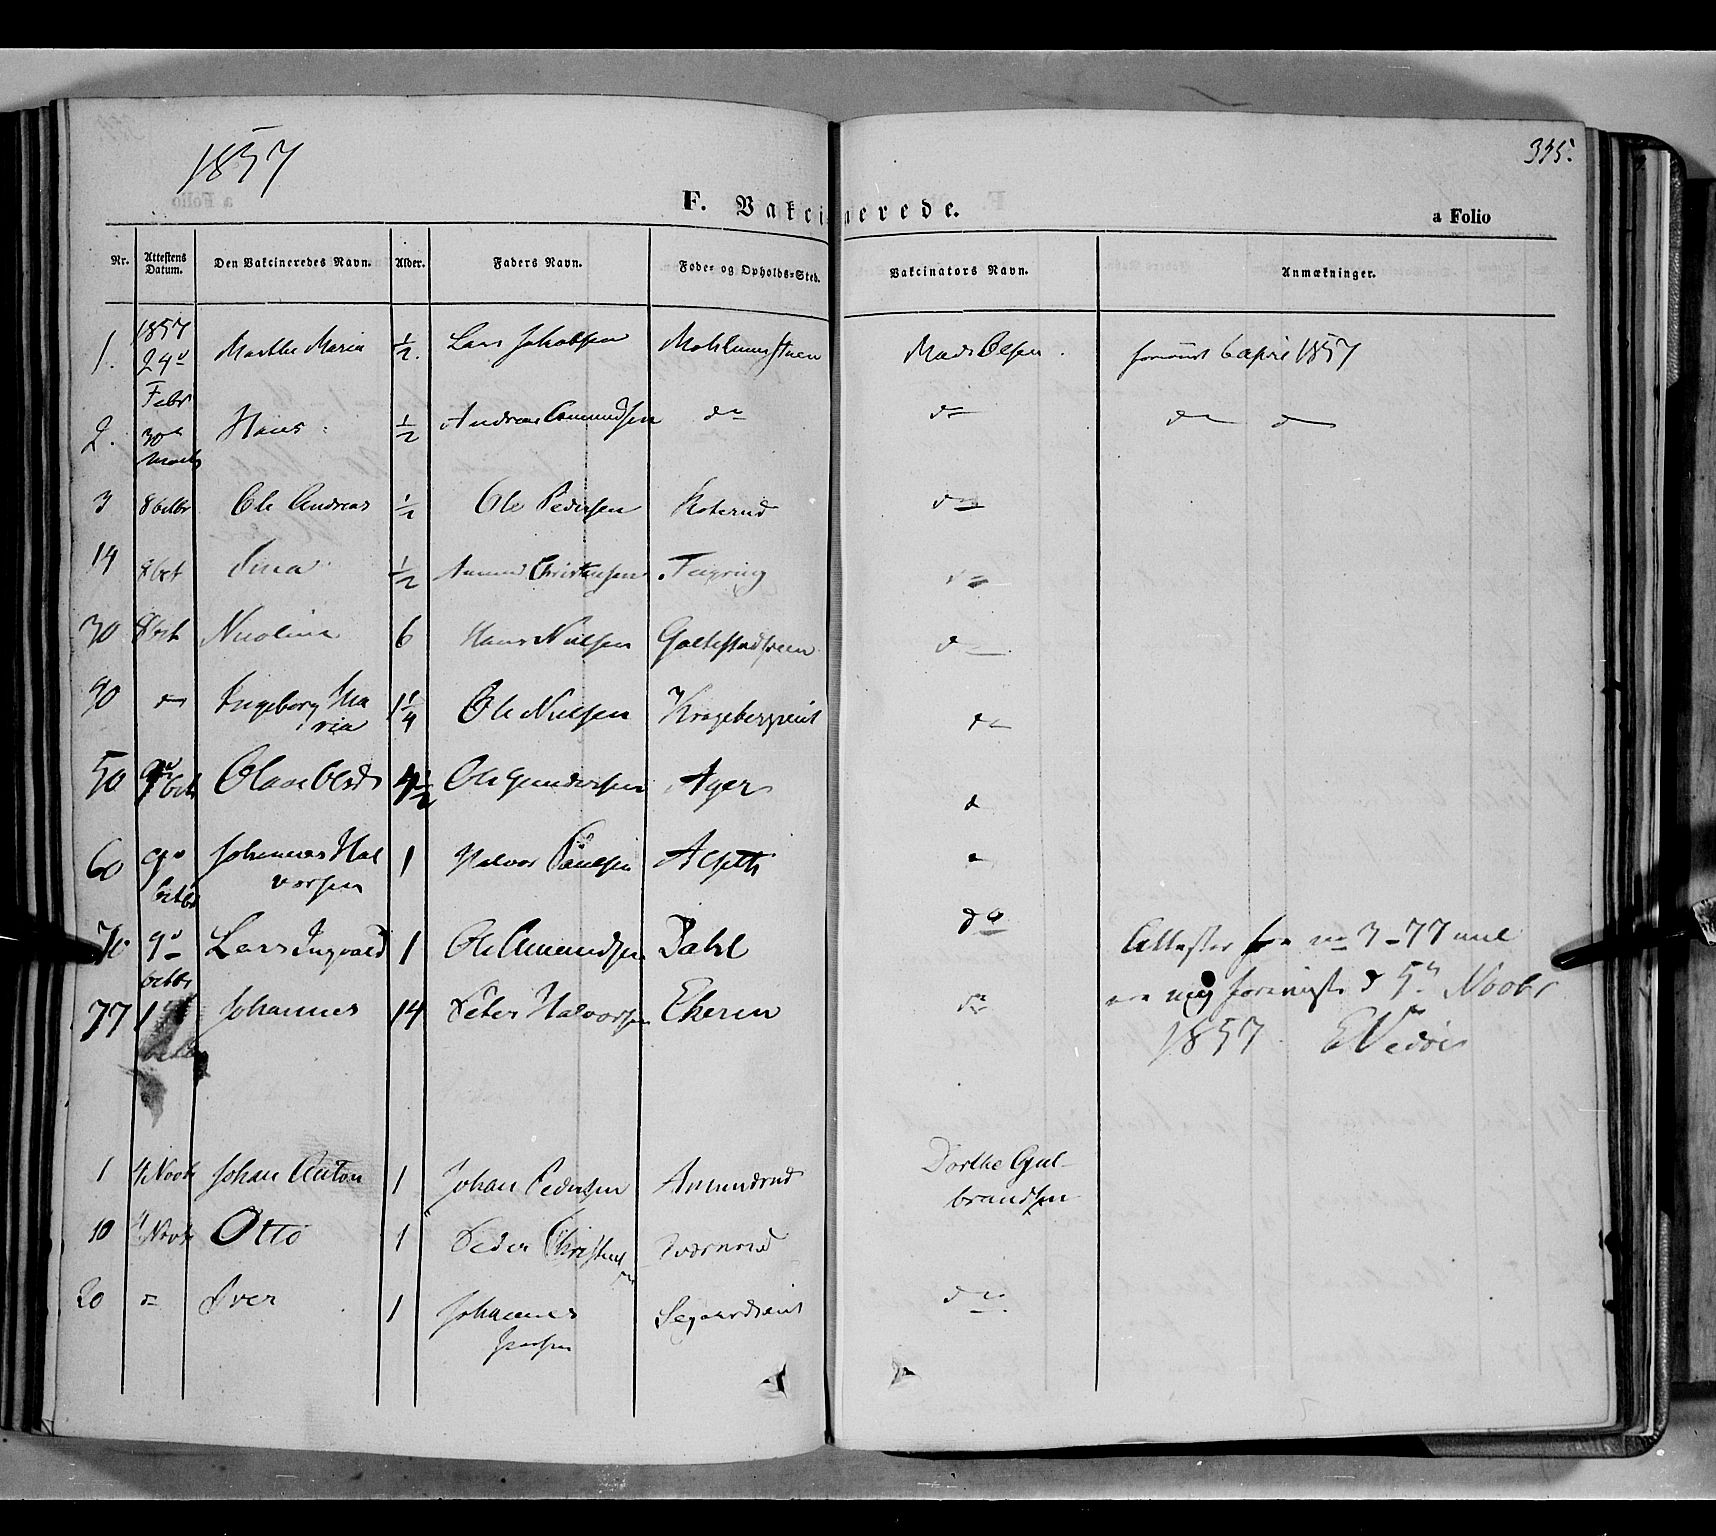 SAH, Biri prestekontor, Ministerialbok nr. 5, 1843-1854, s. 345